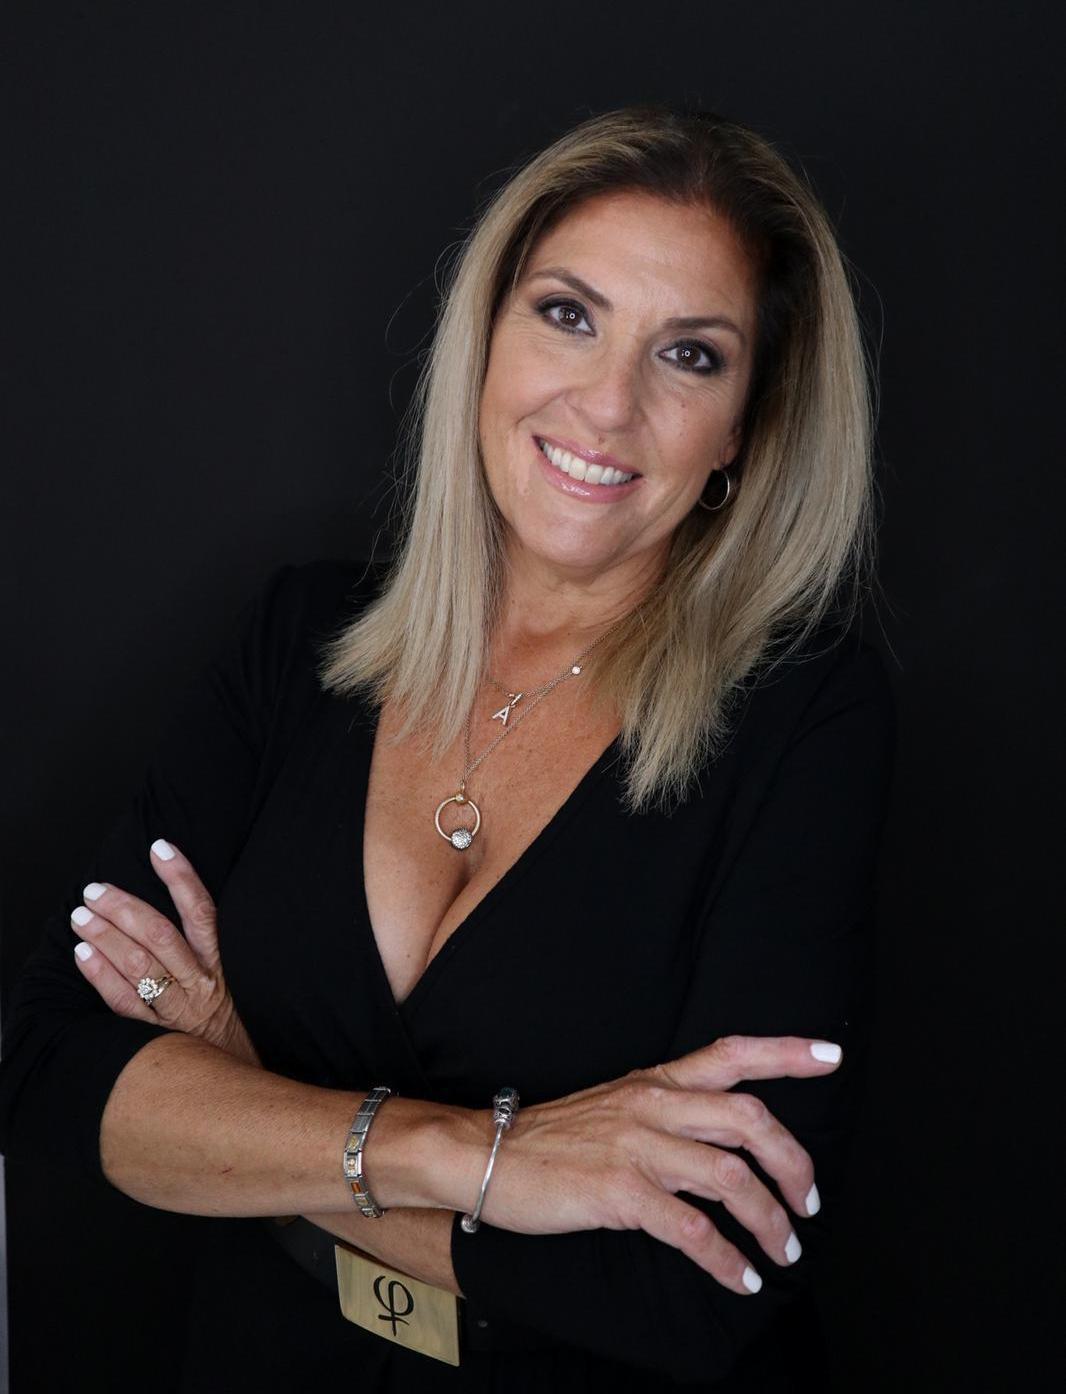 Ava Lynn Garcia